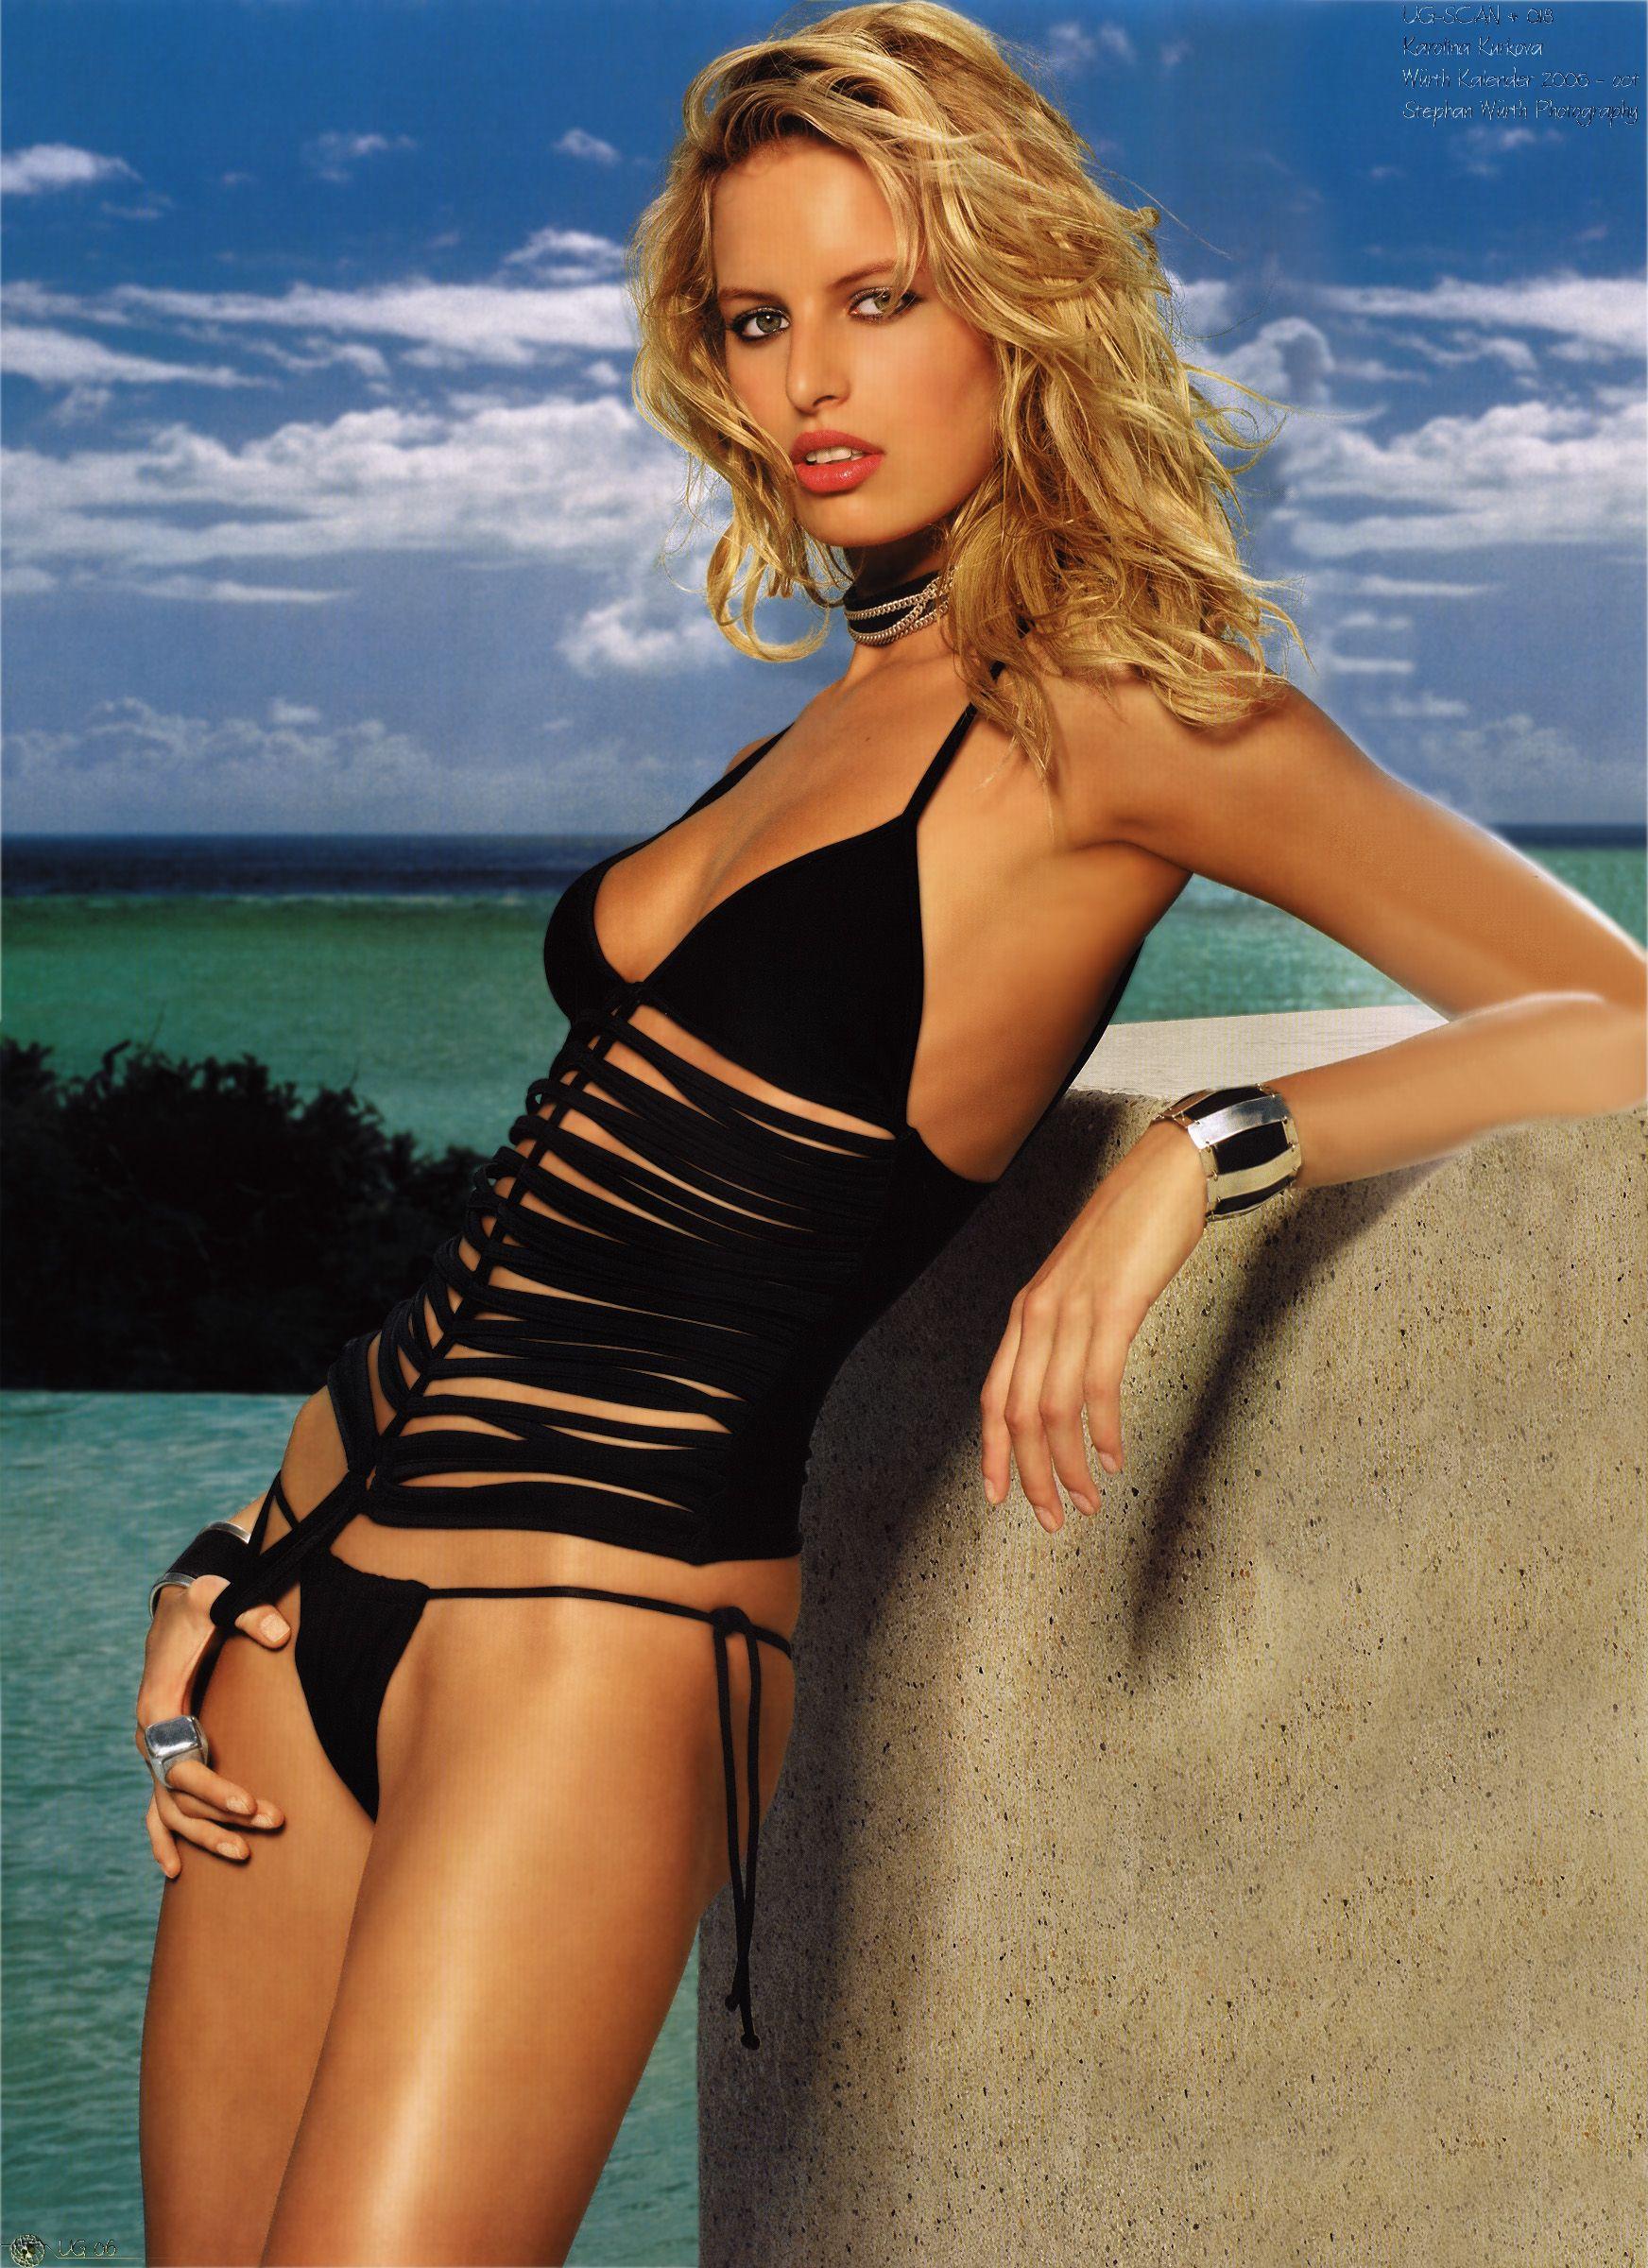 karolina kurkova w rth kalender 2006 sexy karolina. Black Bedroom Furniture Sets. Home Design Ideas